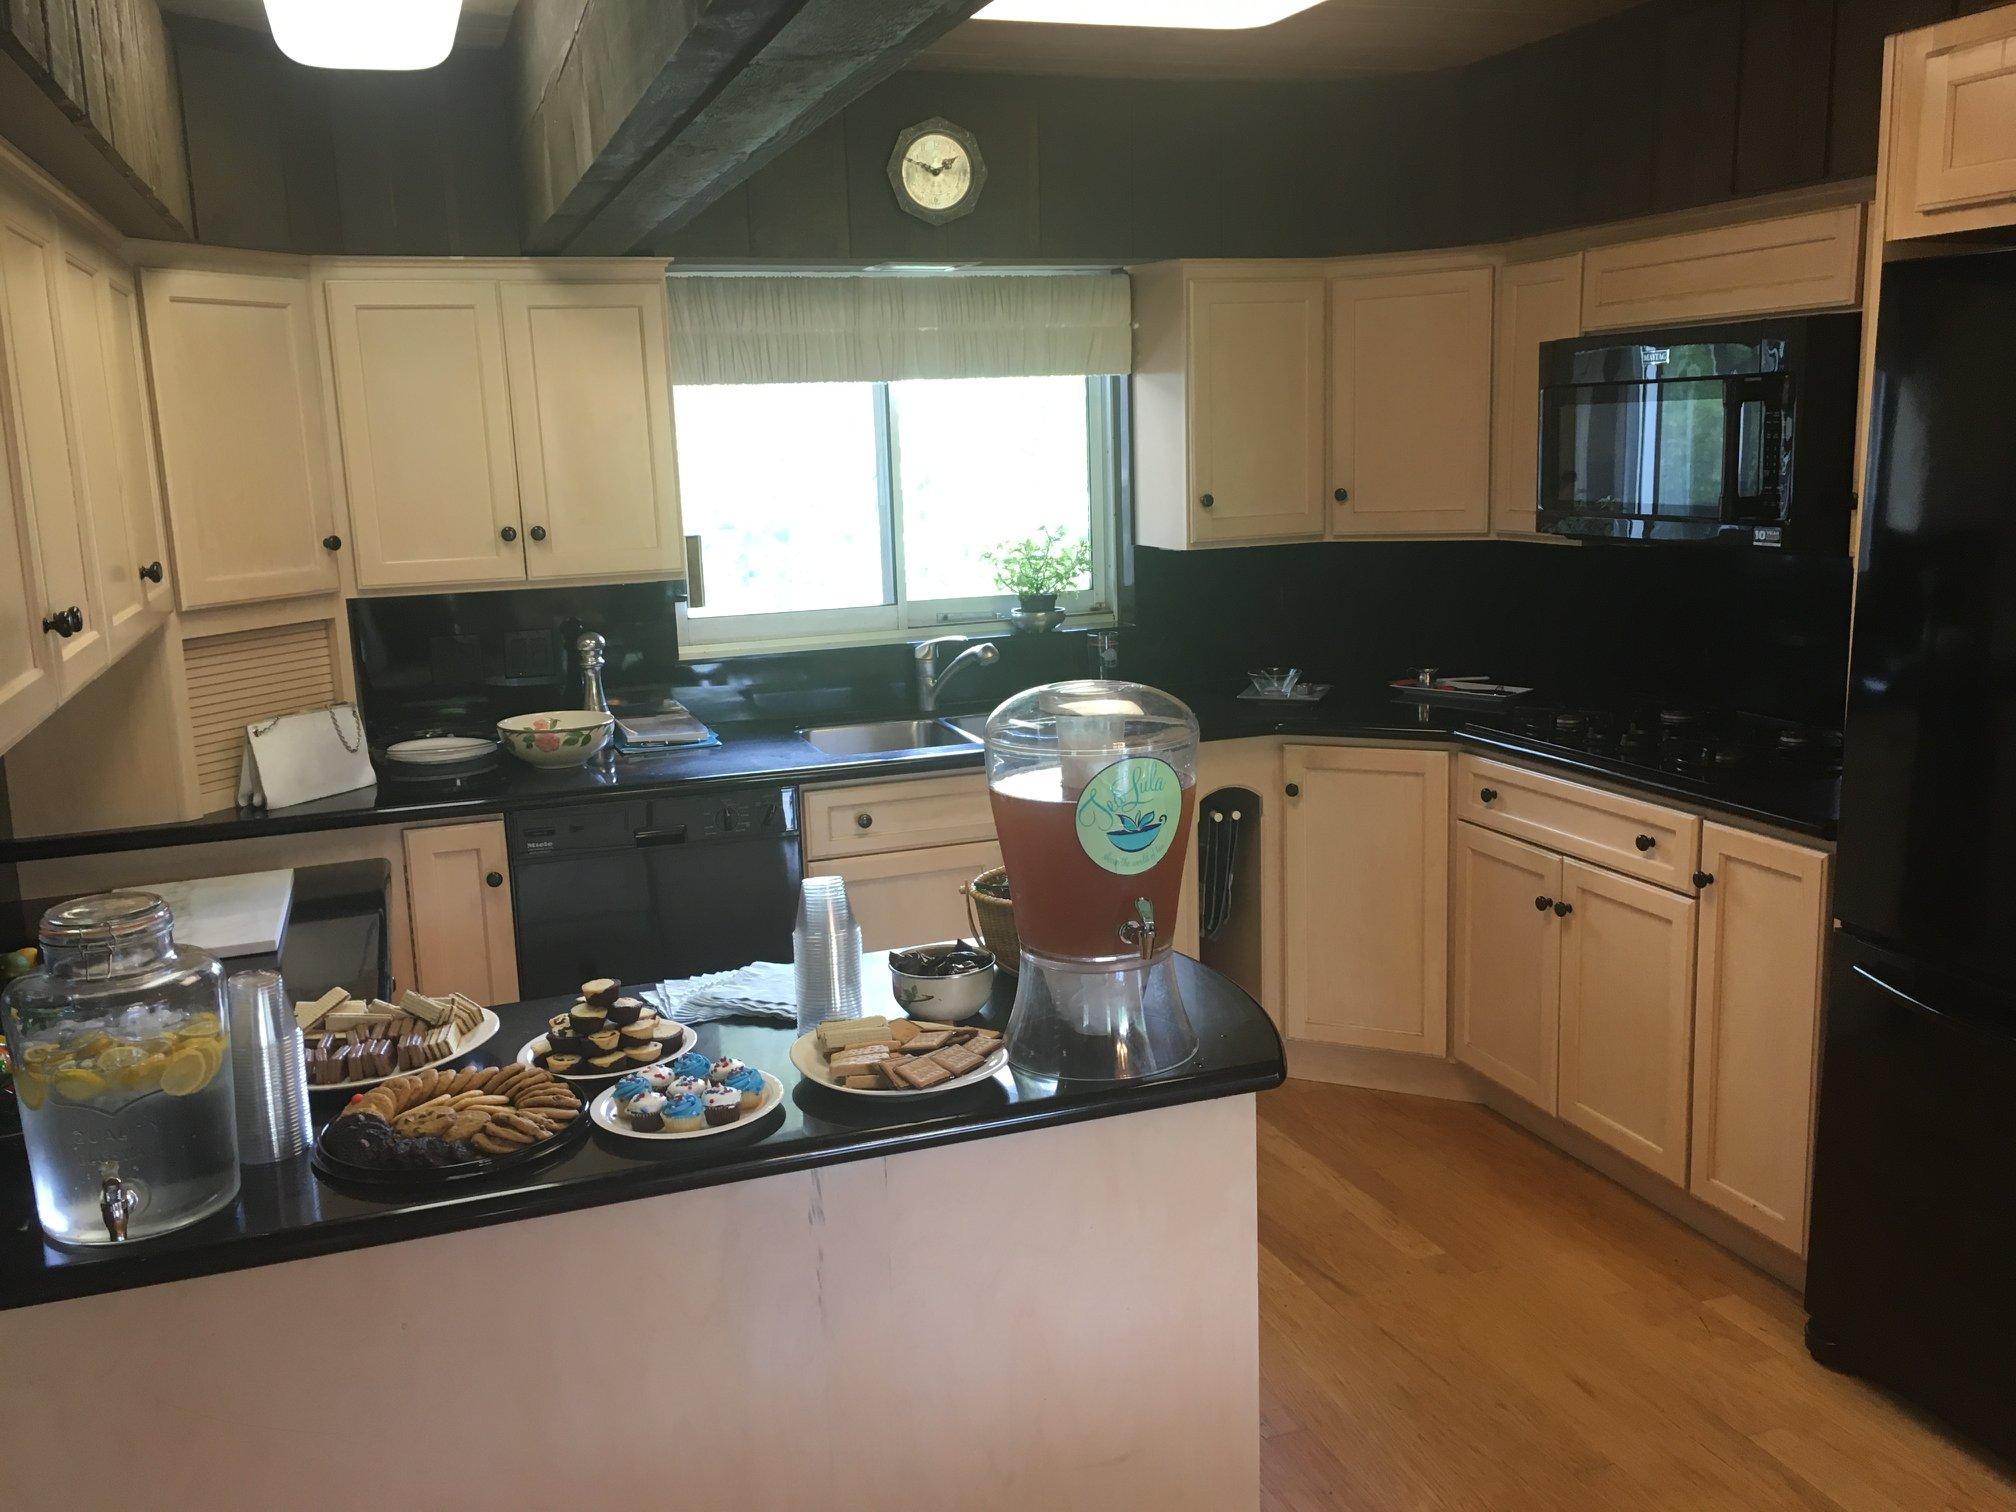 Sunday July 1, 2018 - Don Erickson's Seidel House in Park Ridge